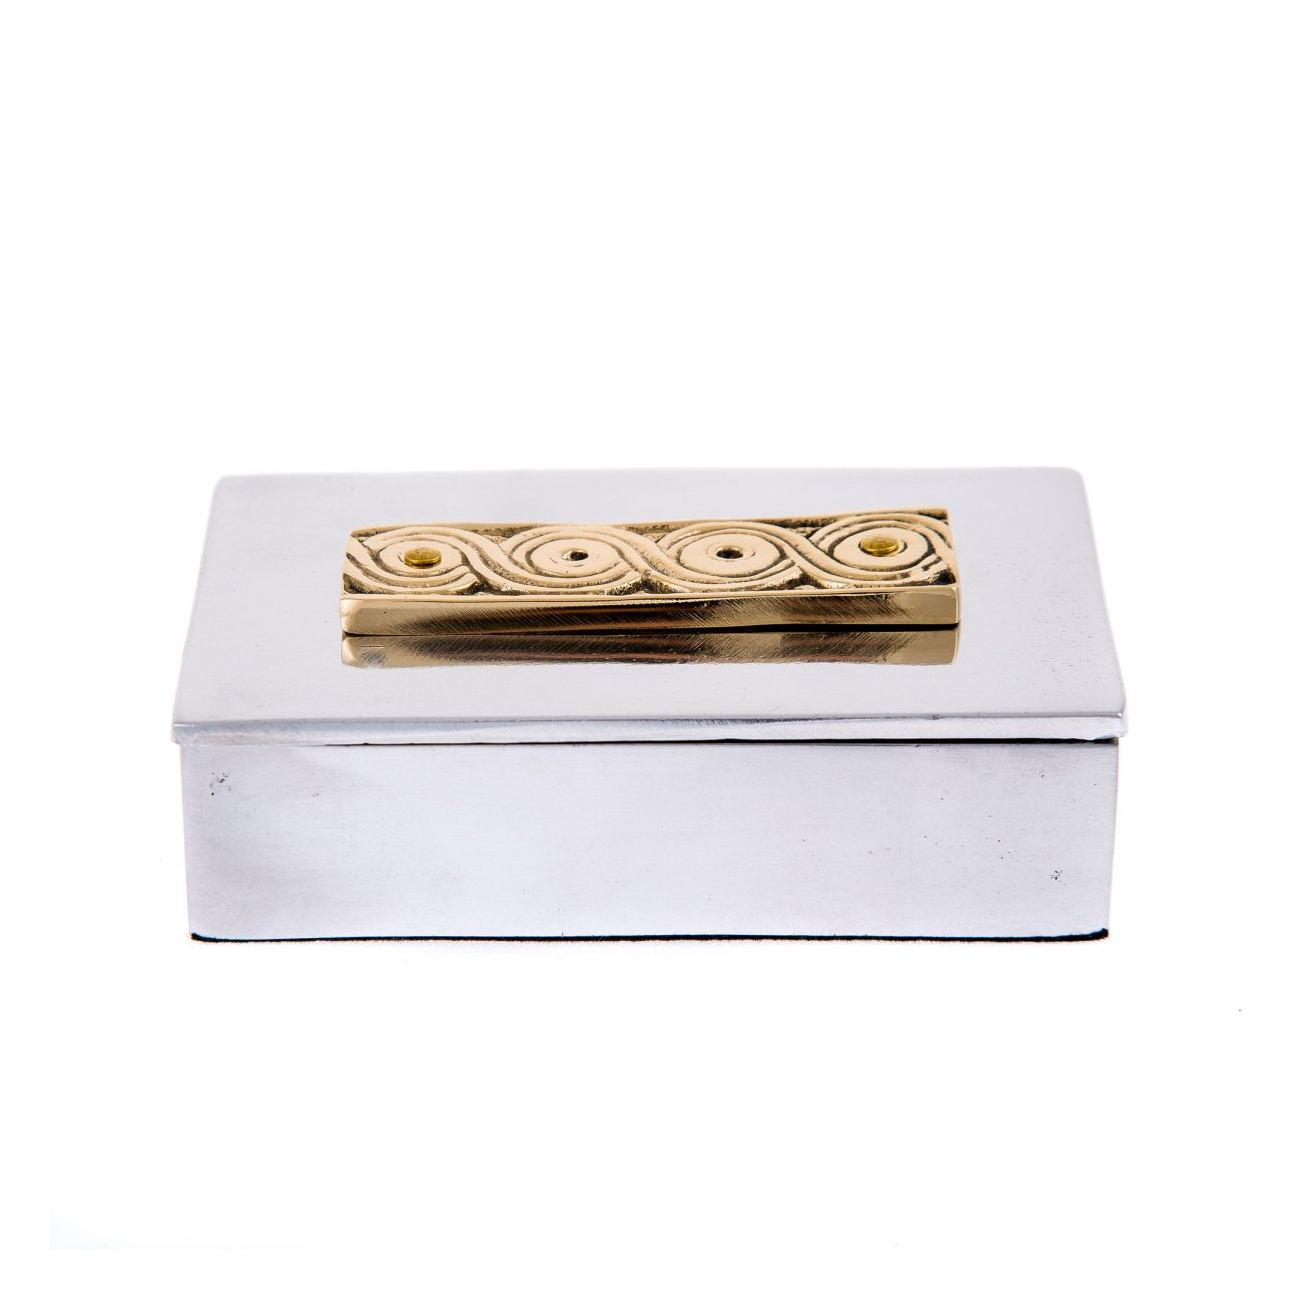 Desk Accessories Set Of 2 Archaic Design Handmade Solid Metal Decorative Storage Box Business Card Holder